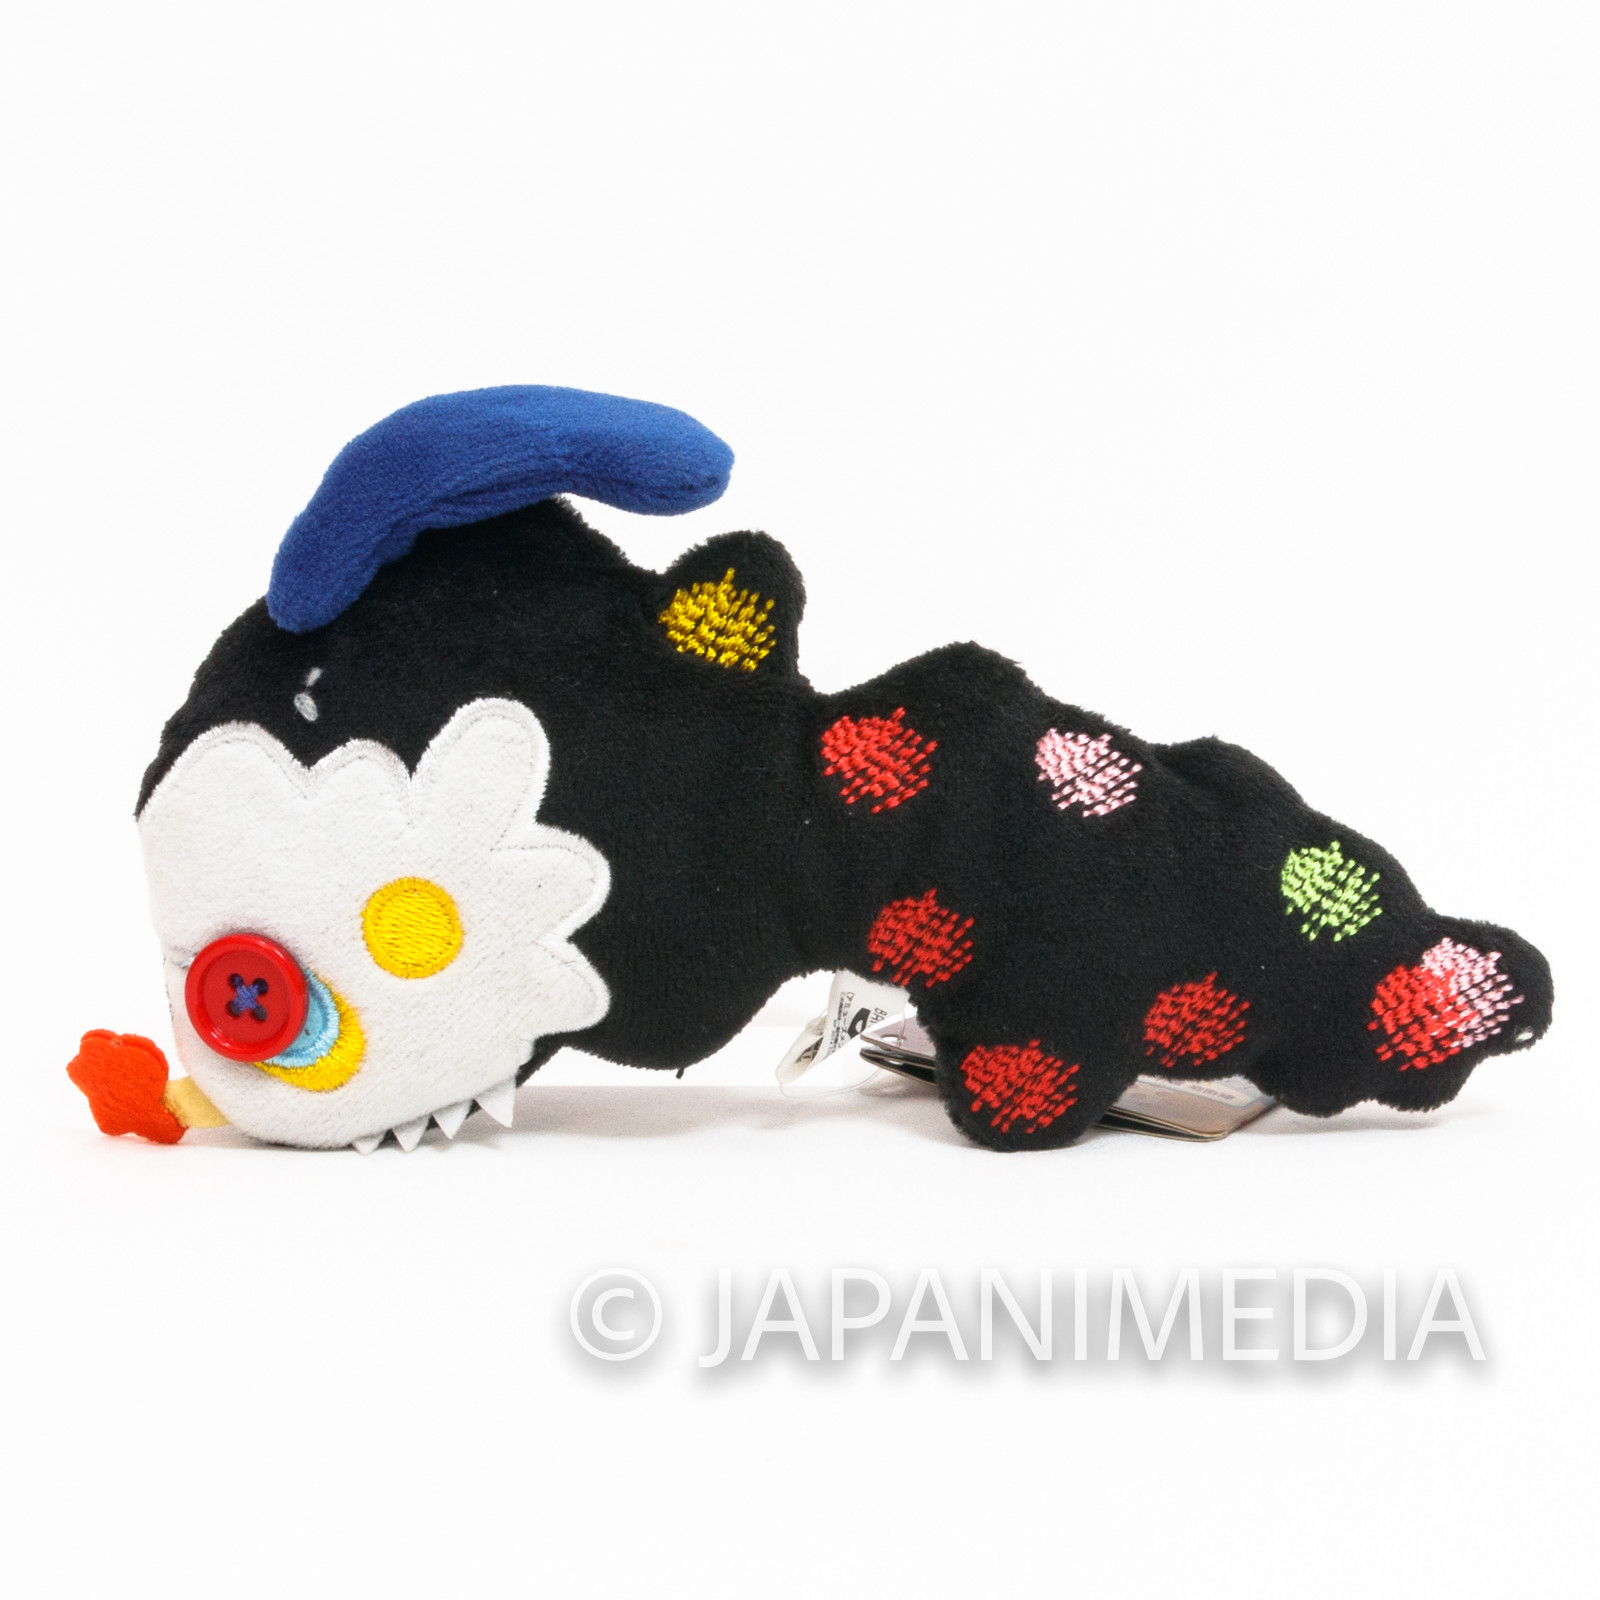 Puella Magi Madoka Magica Charlotte Witch Plush Doll Ballchain JAPAN ANIME